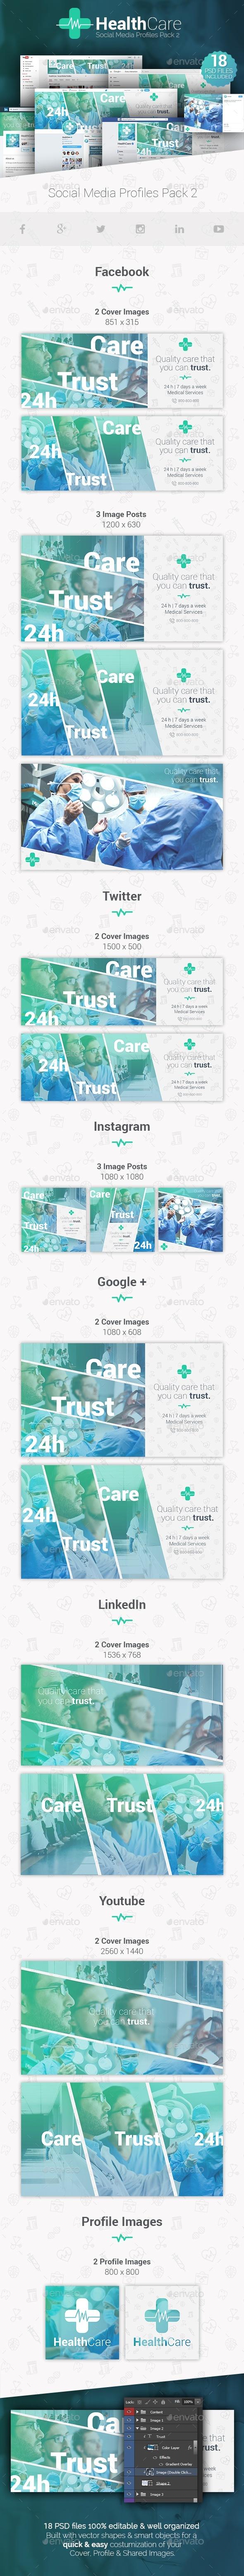 GraphicRiver HealthCare Social Media Cover Profile Pack 2 20873721